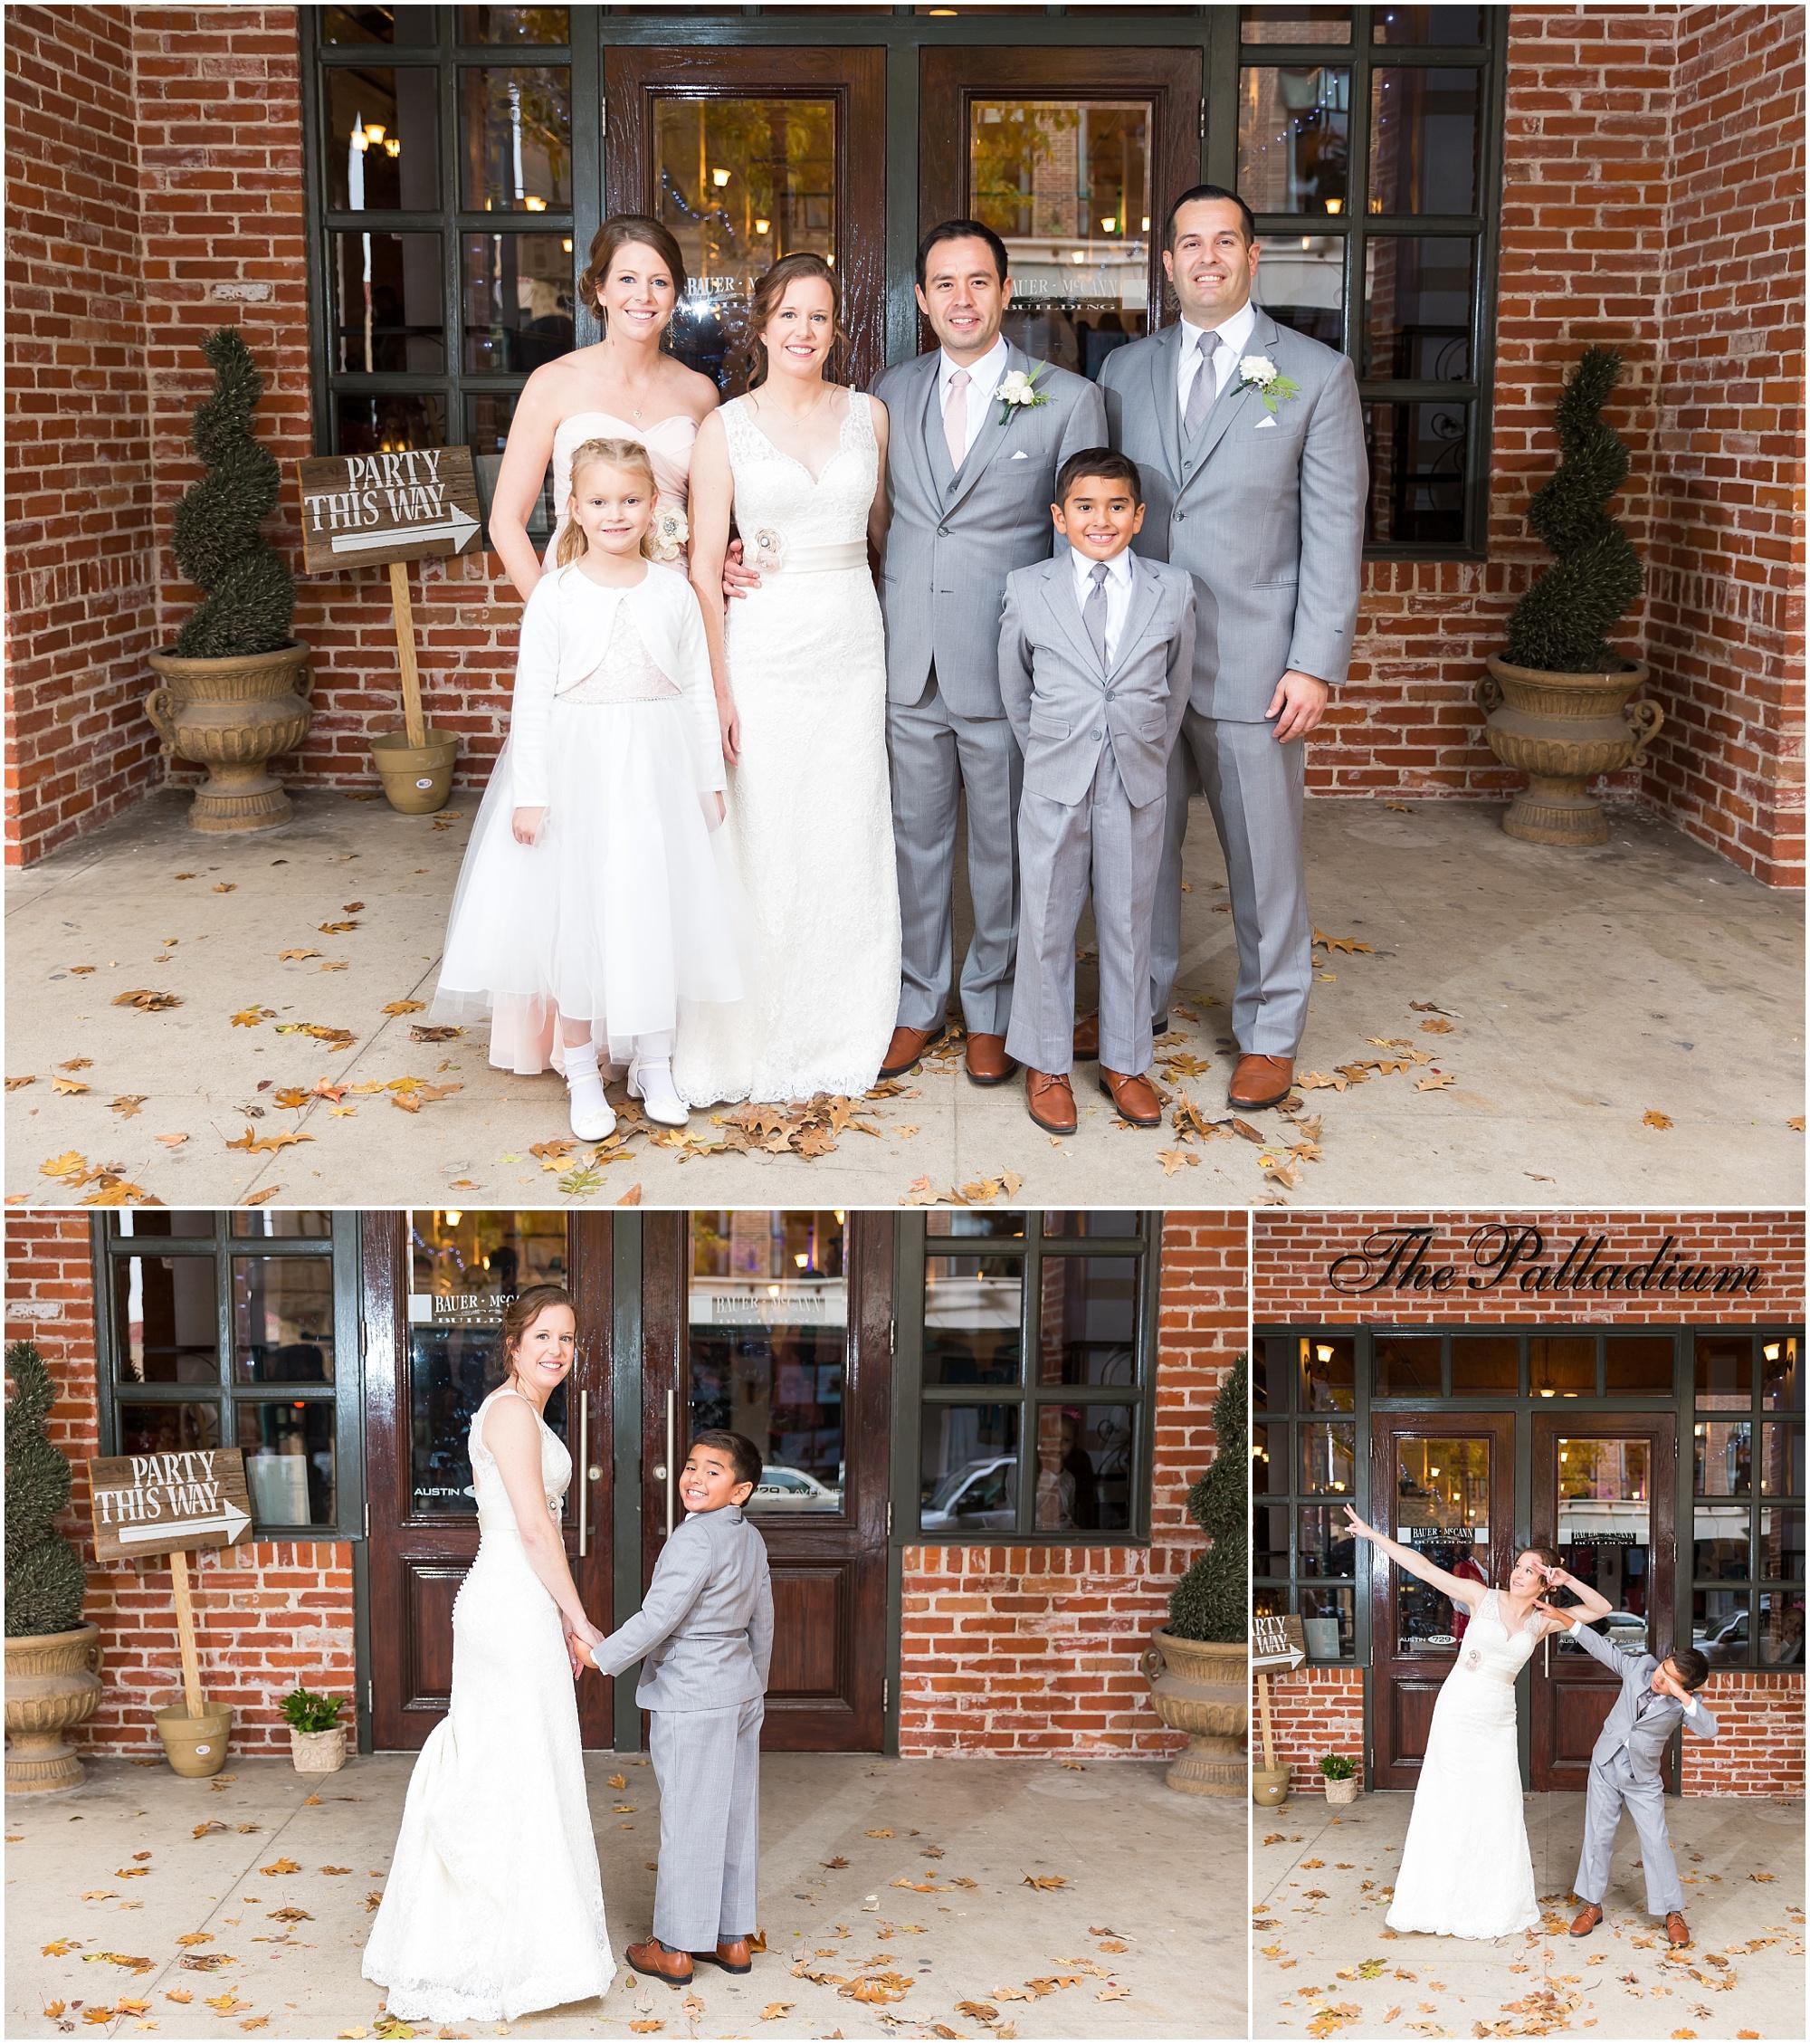 Downtown-Waco-Fall-Wedding_0032.jpg